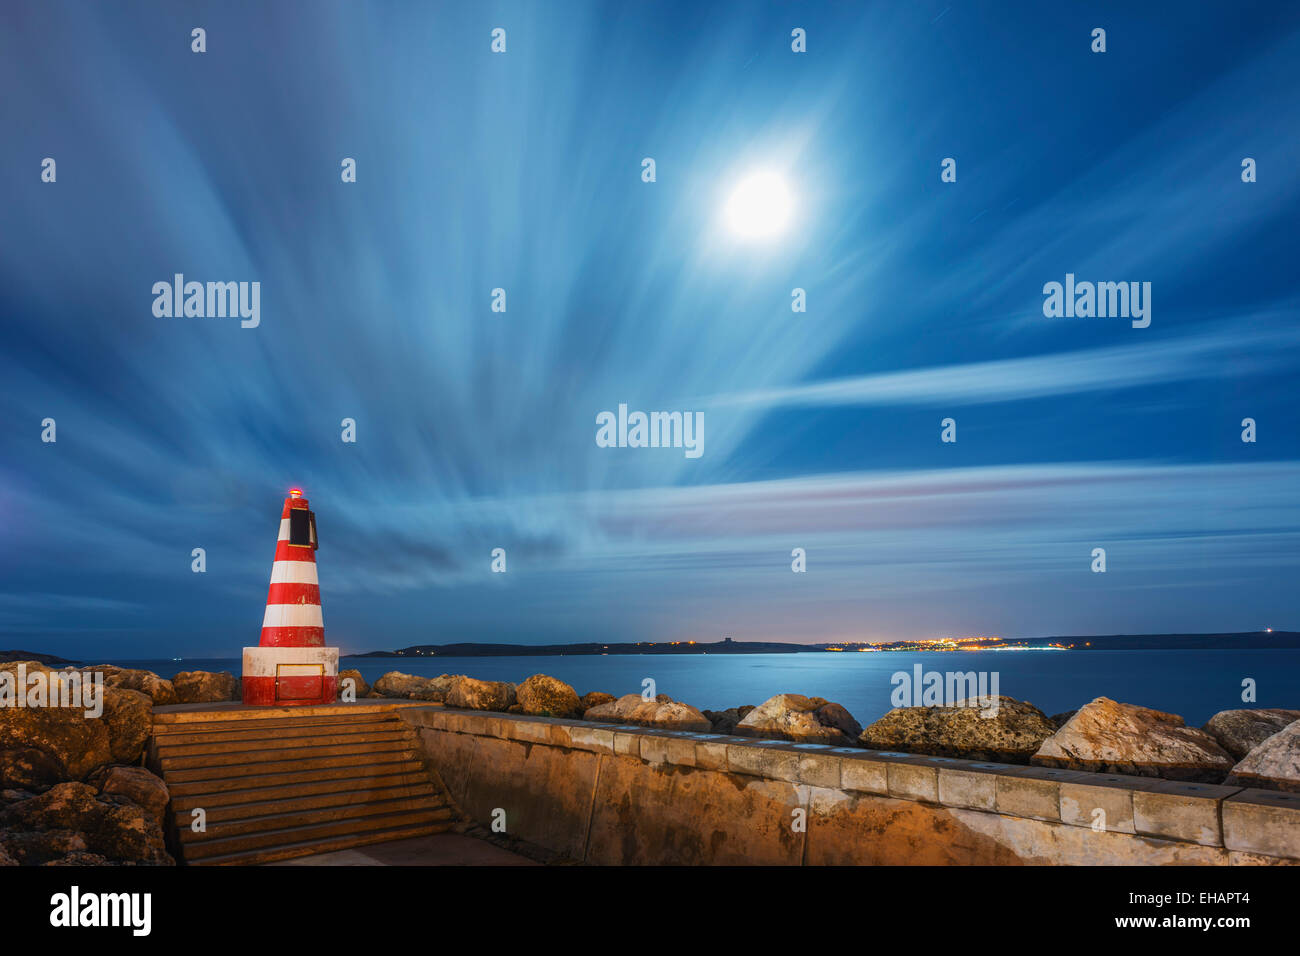 Mediterranean Europe, Malta, Gozo Island, port town of Mgarr, lighthouse - Stock Image